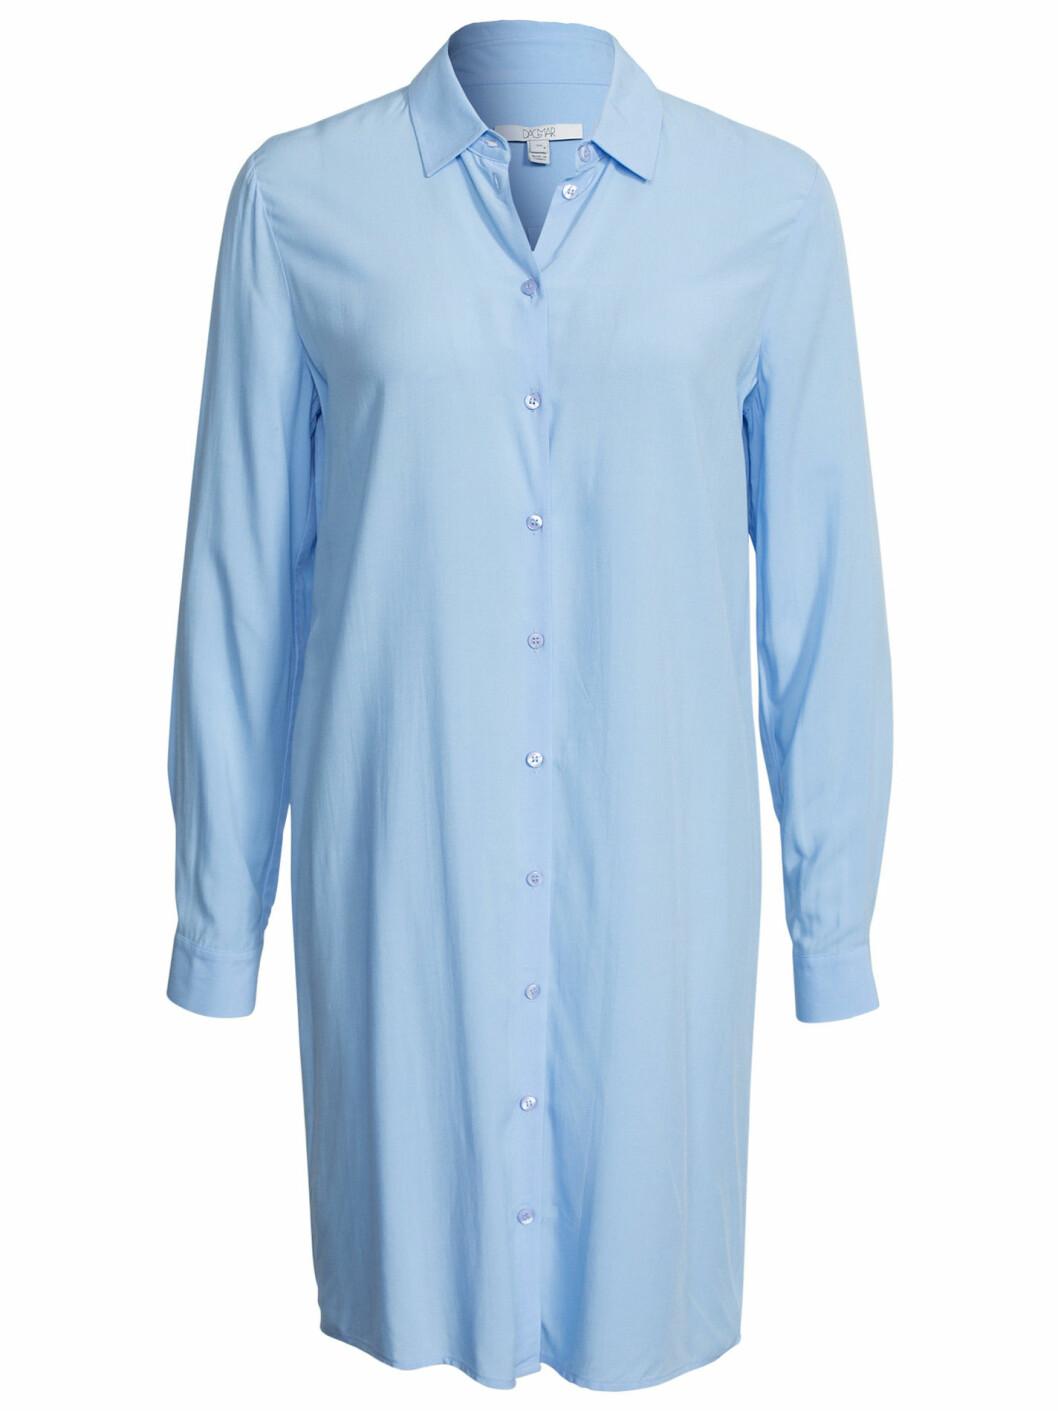 bla skjortklanning